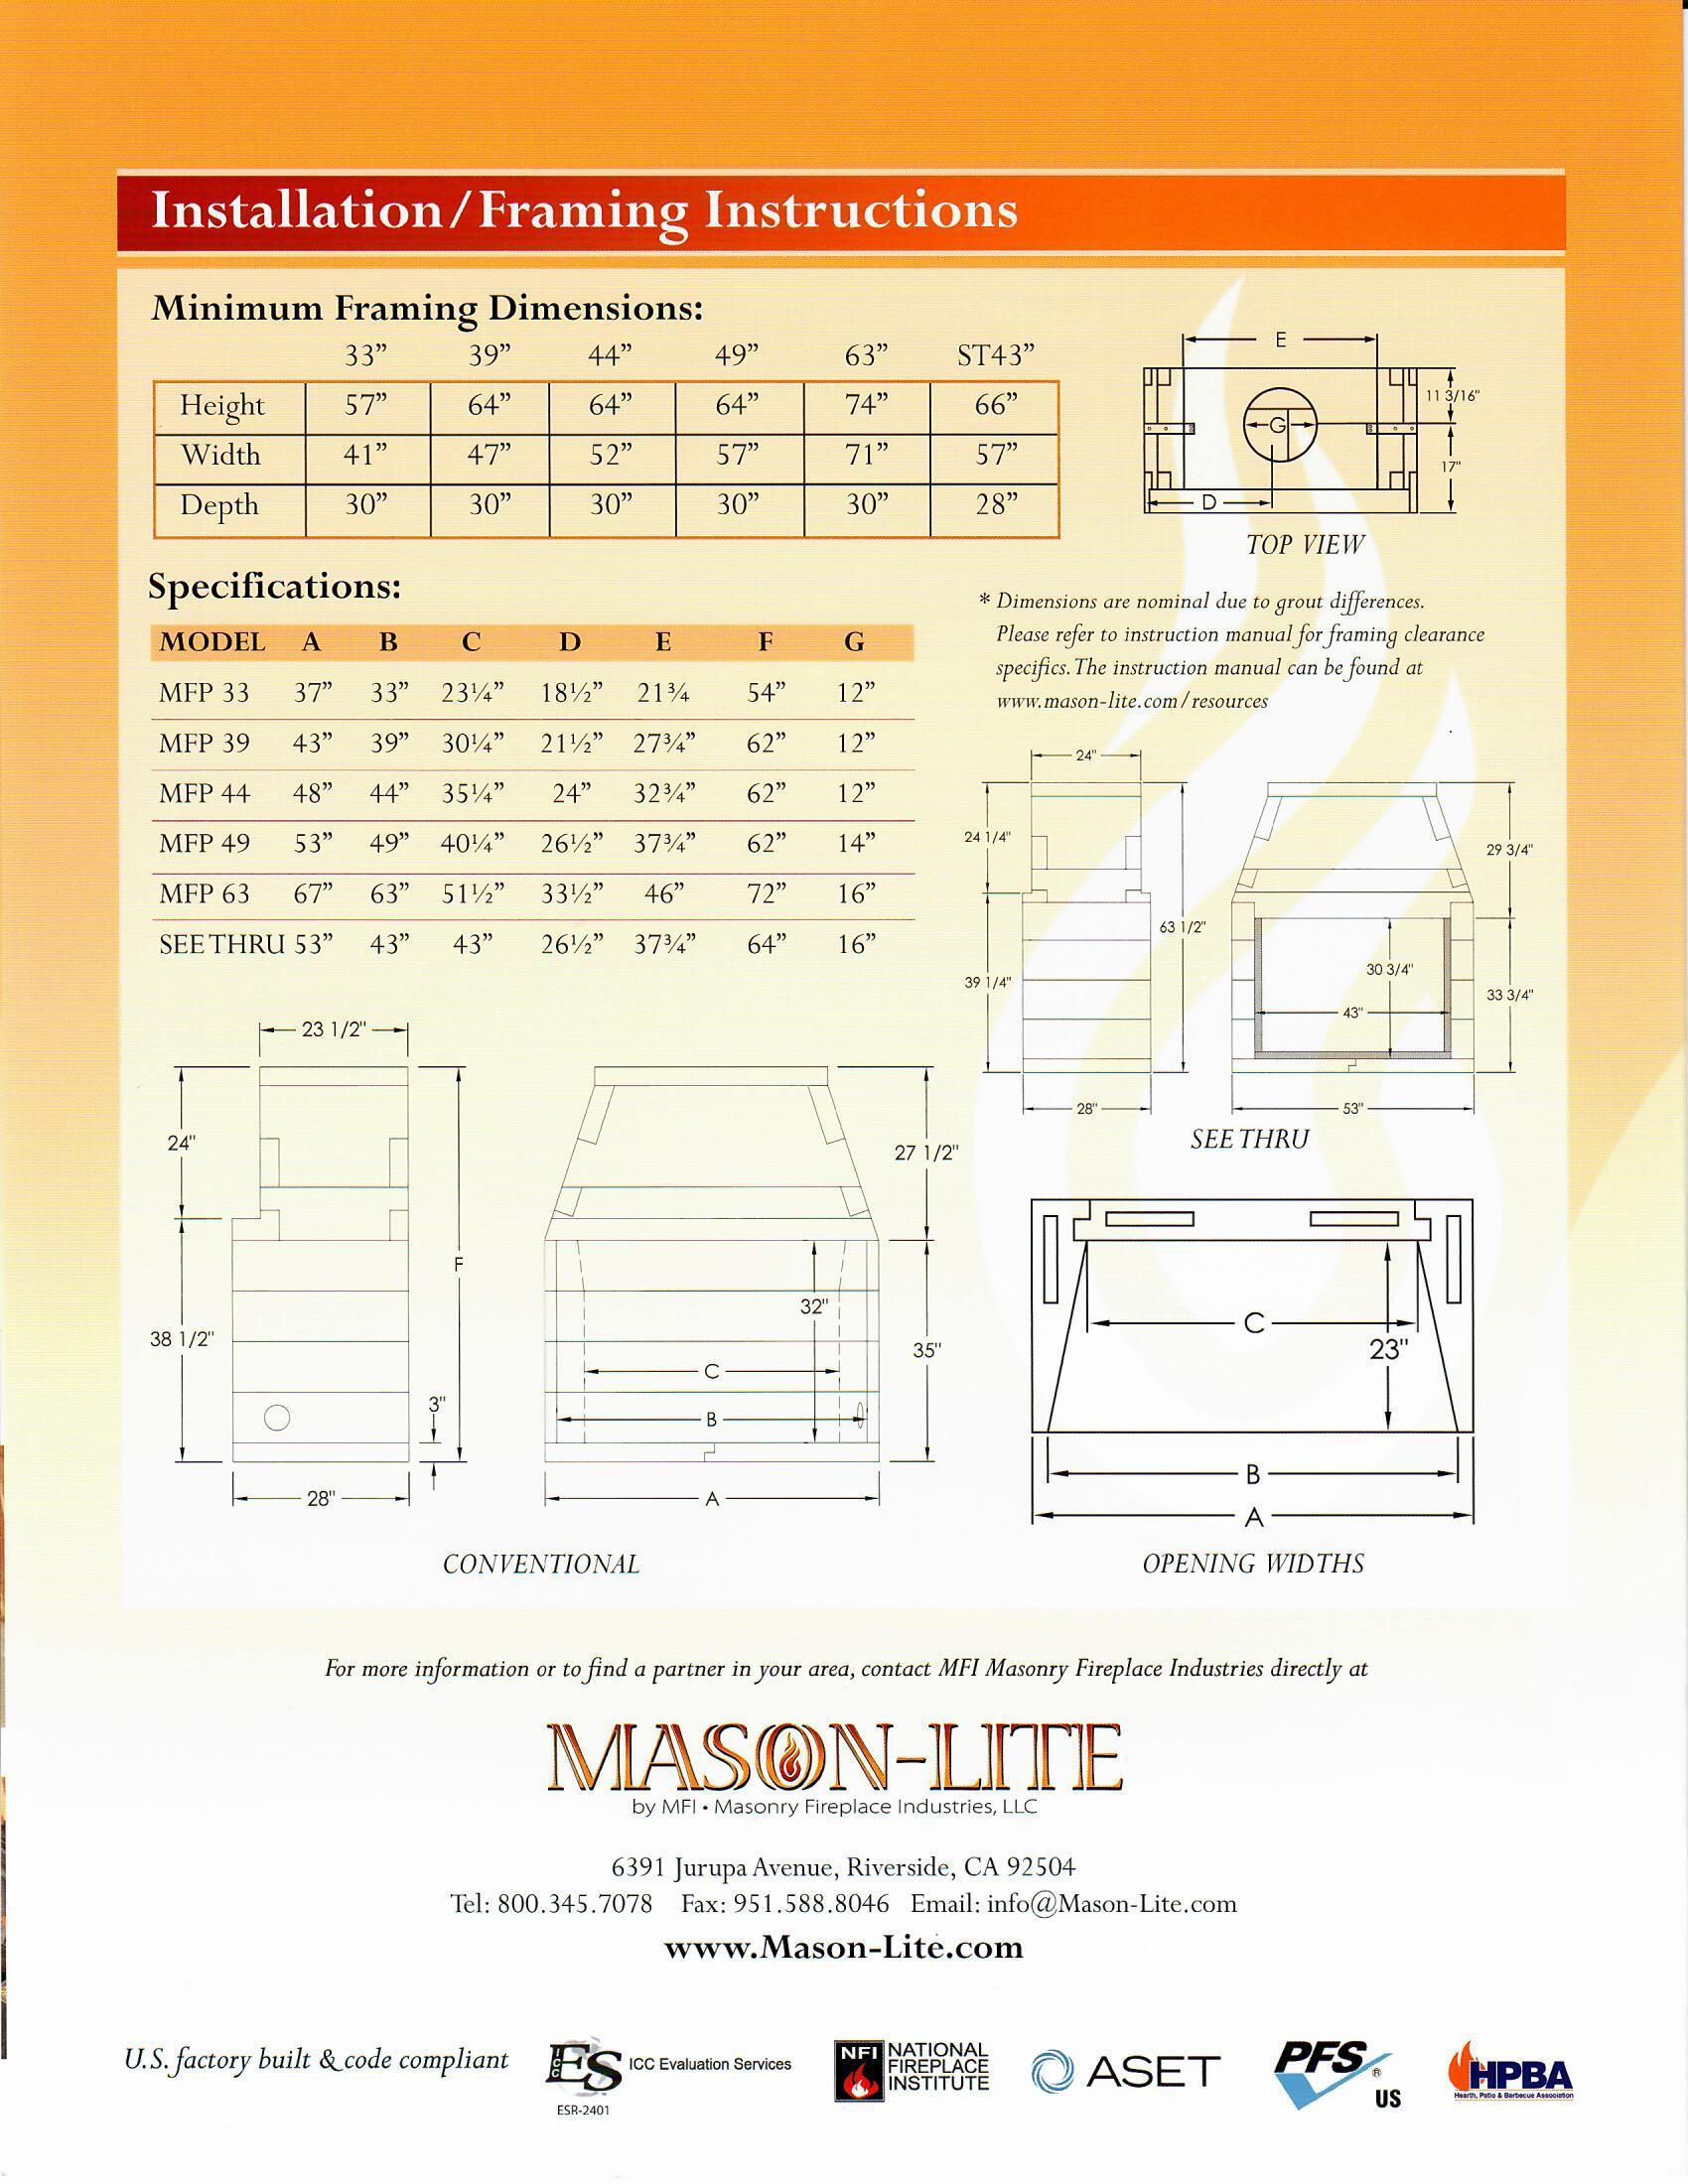 Mason-Lite Information Sheet